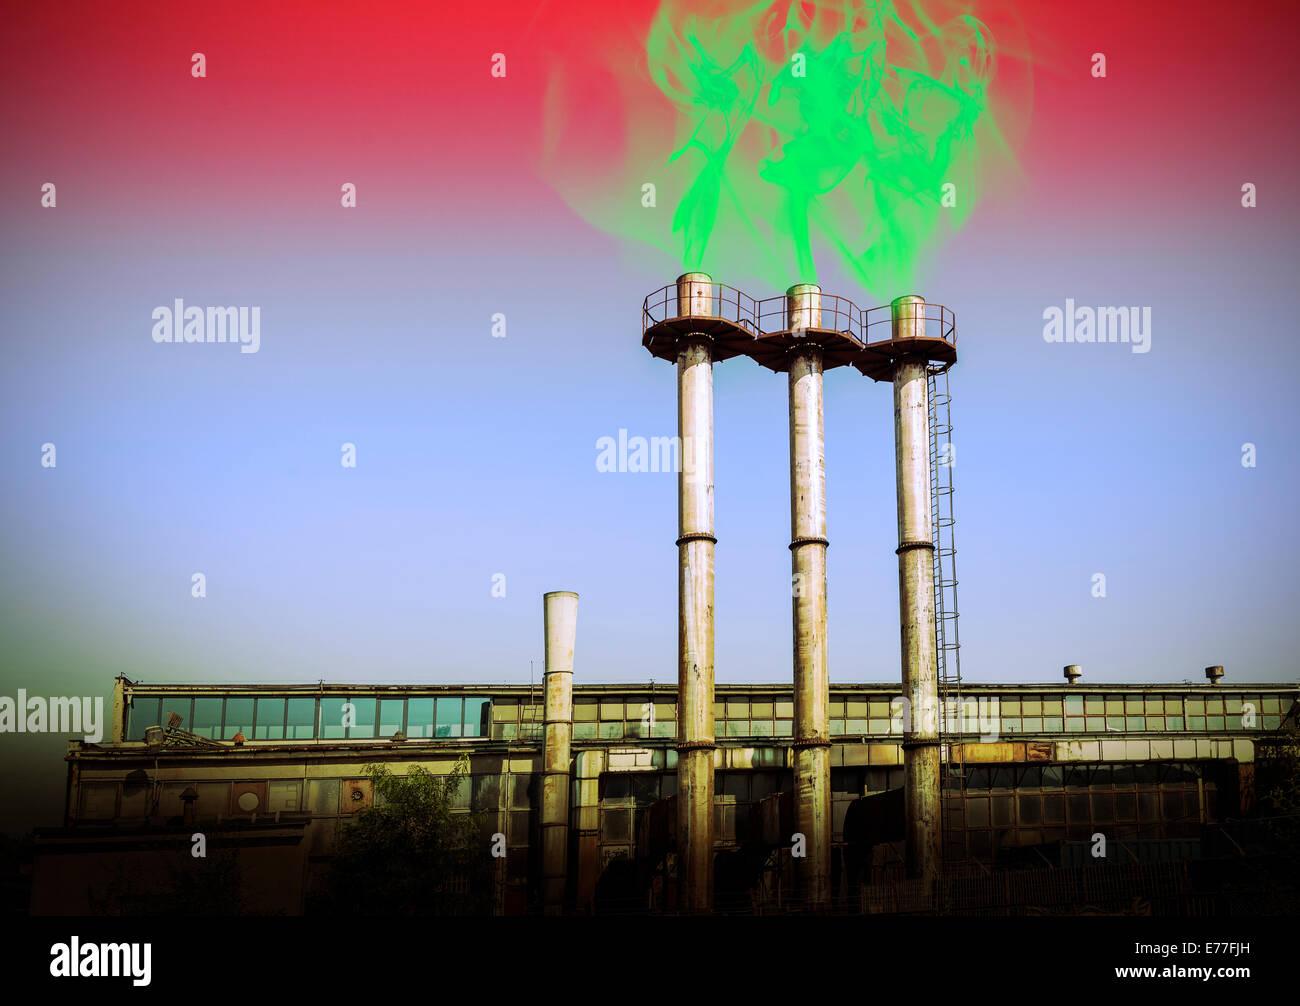 Smoking chimneys, environmental destruction toxic concept. - Stock Image